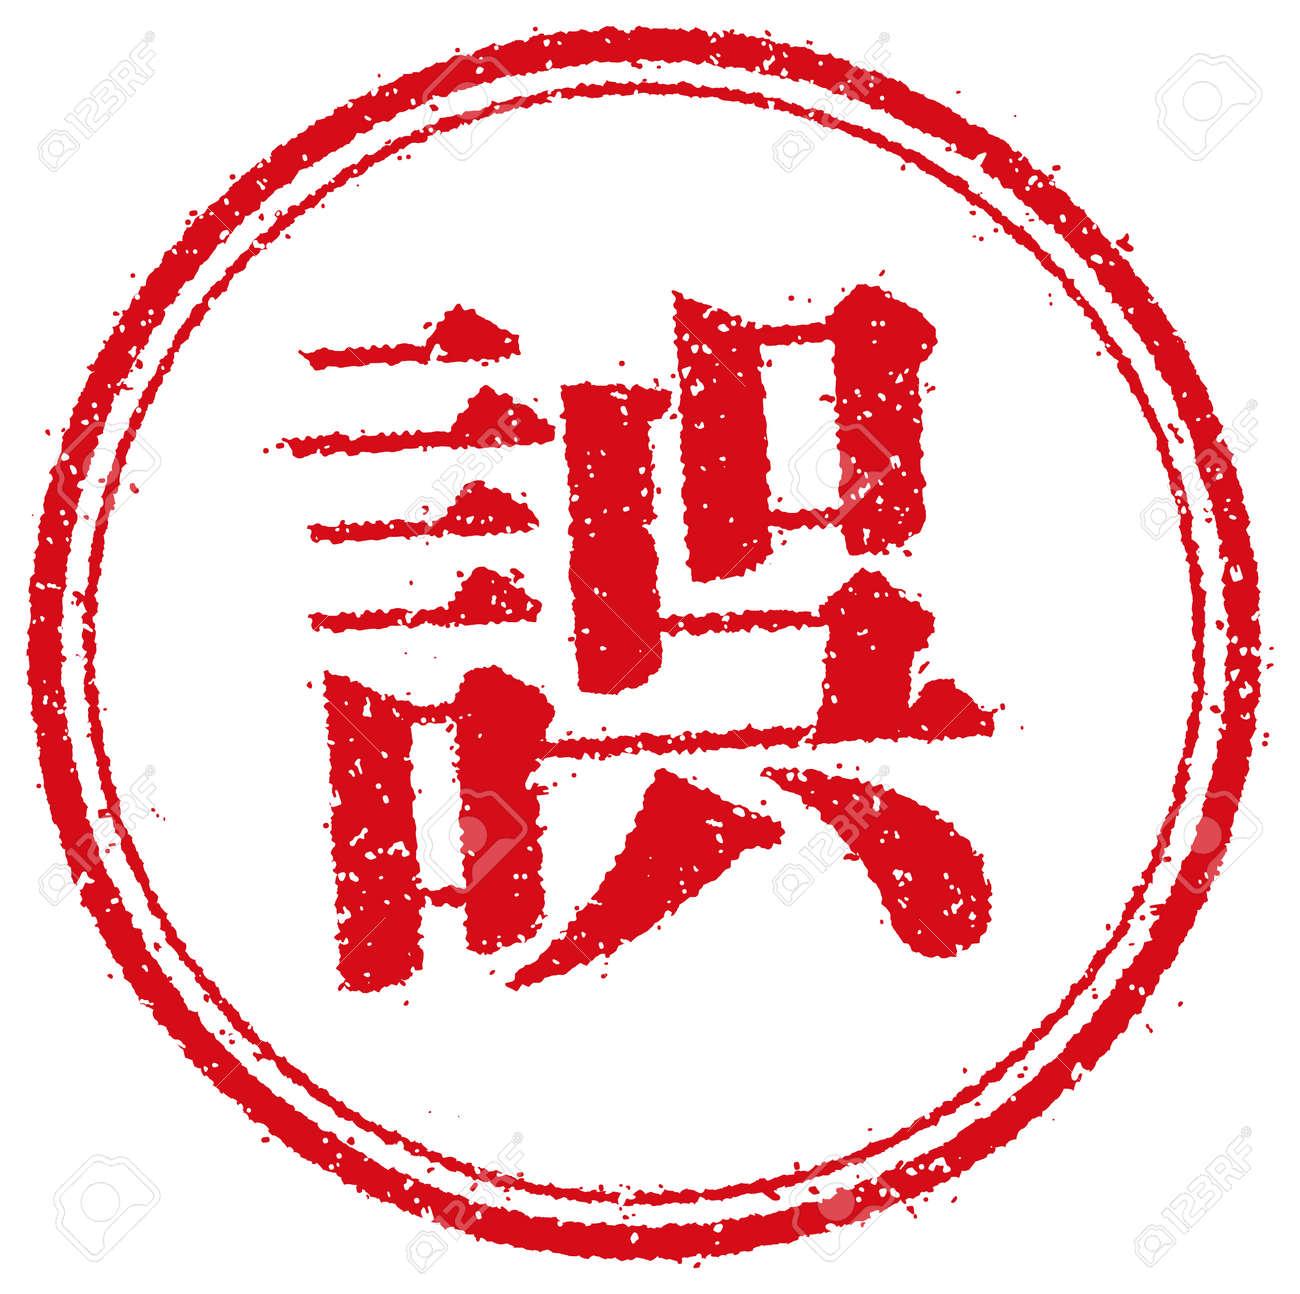 Rubber stamp illustration for Japanese business | error, incorrect - 168732374